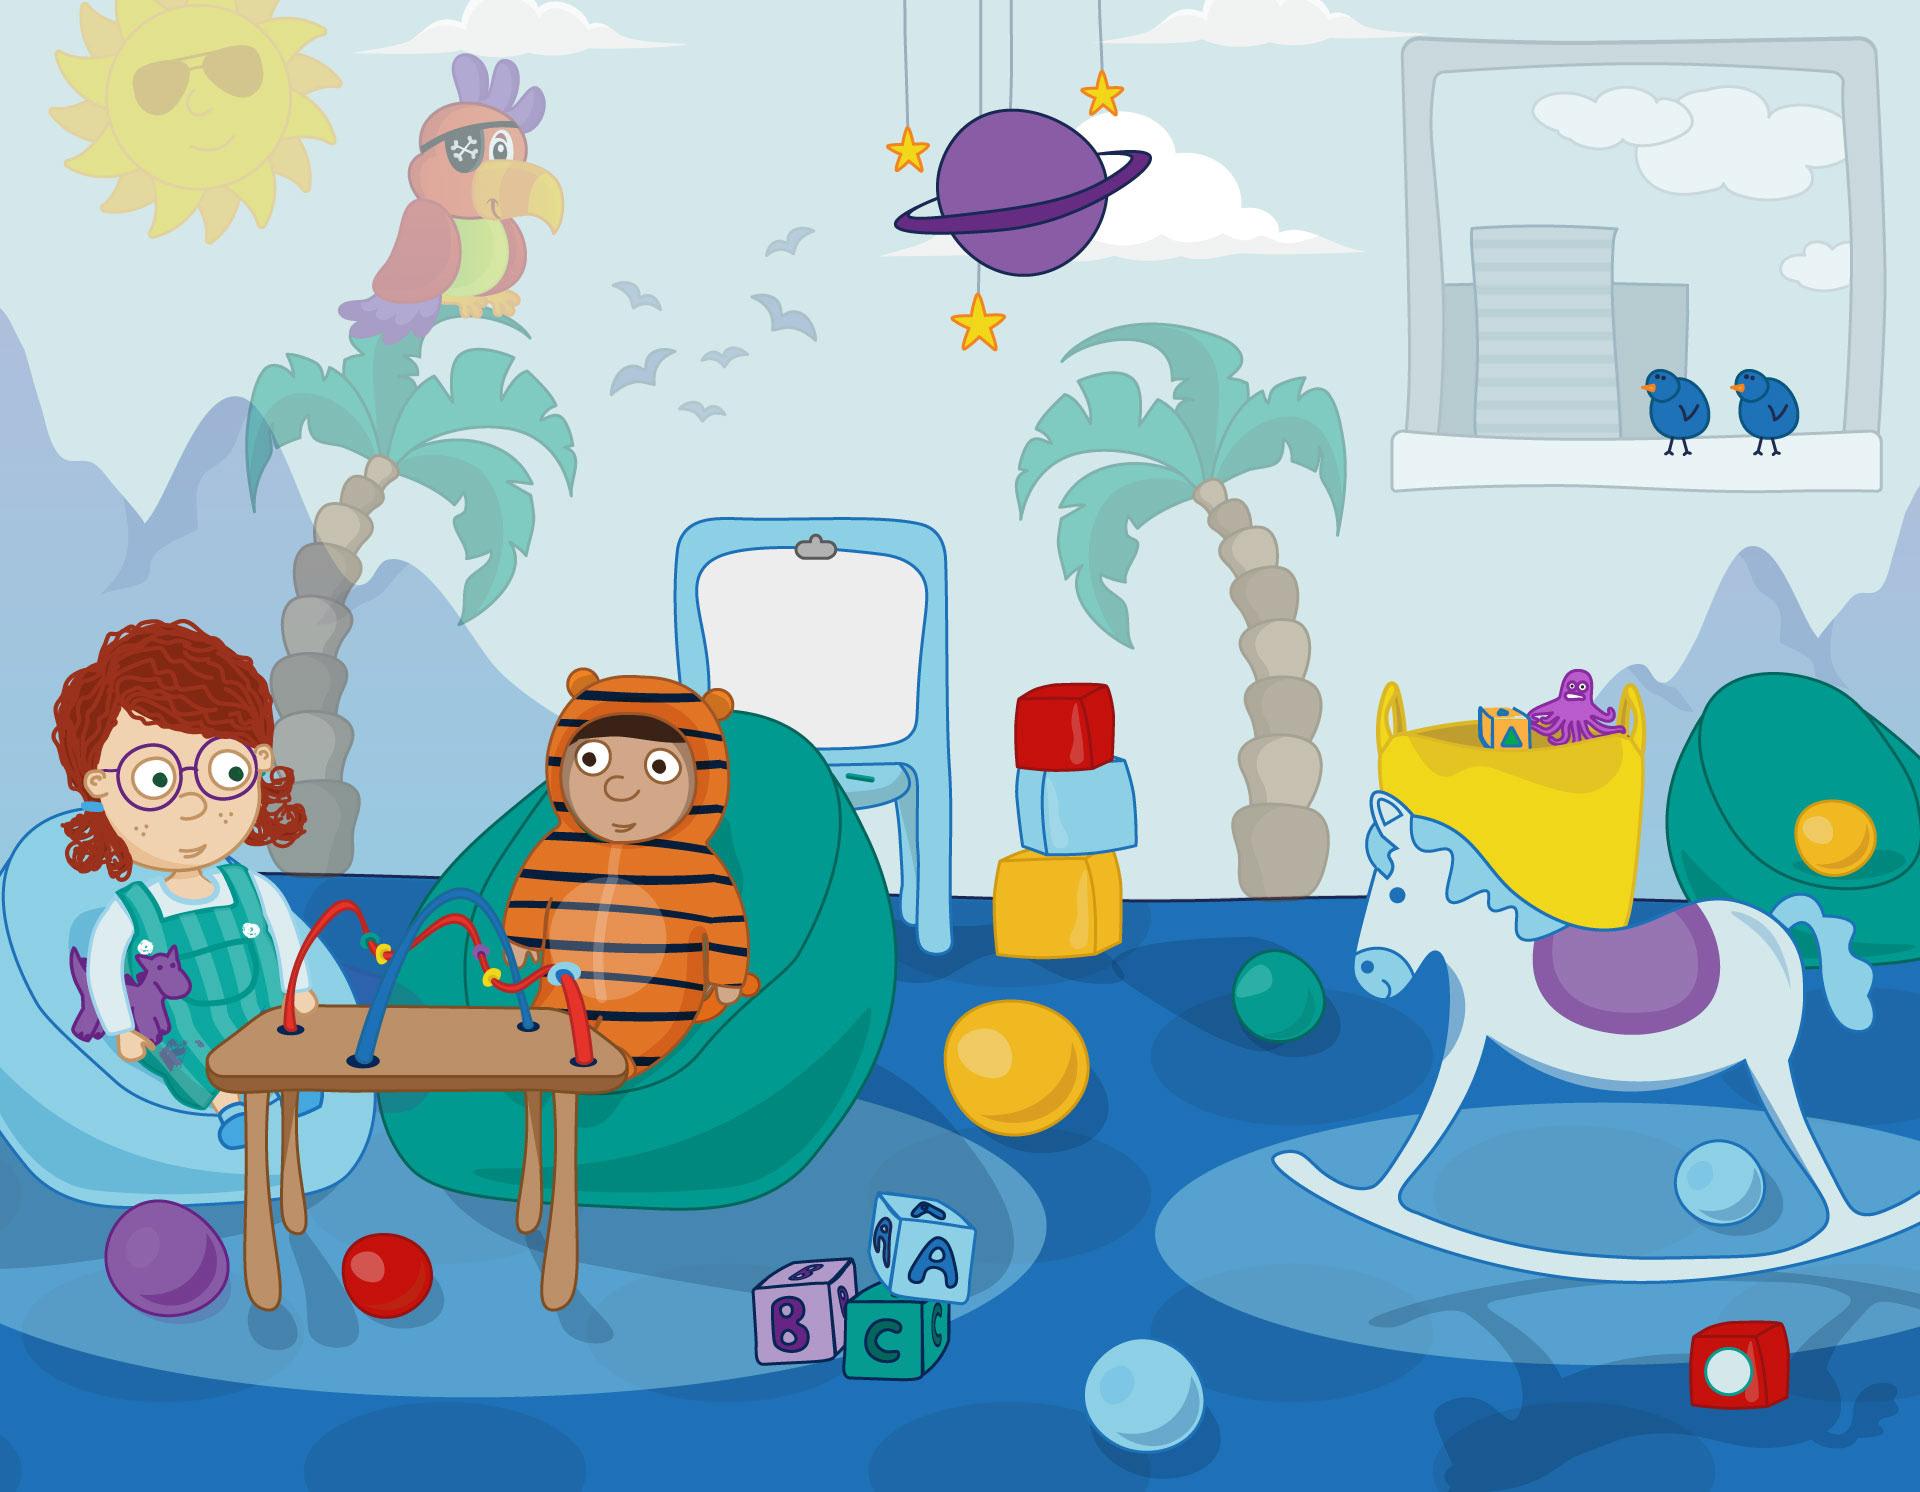 Hetty & Priya in the Interactive Games Room